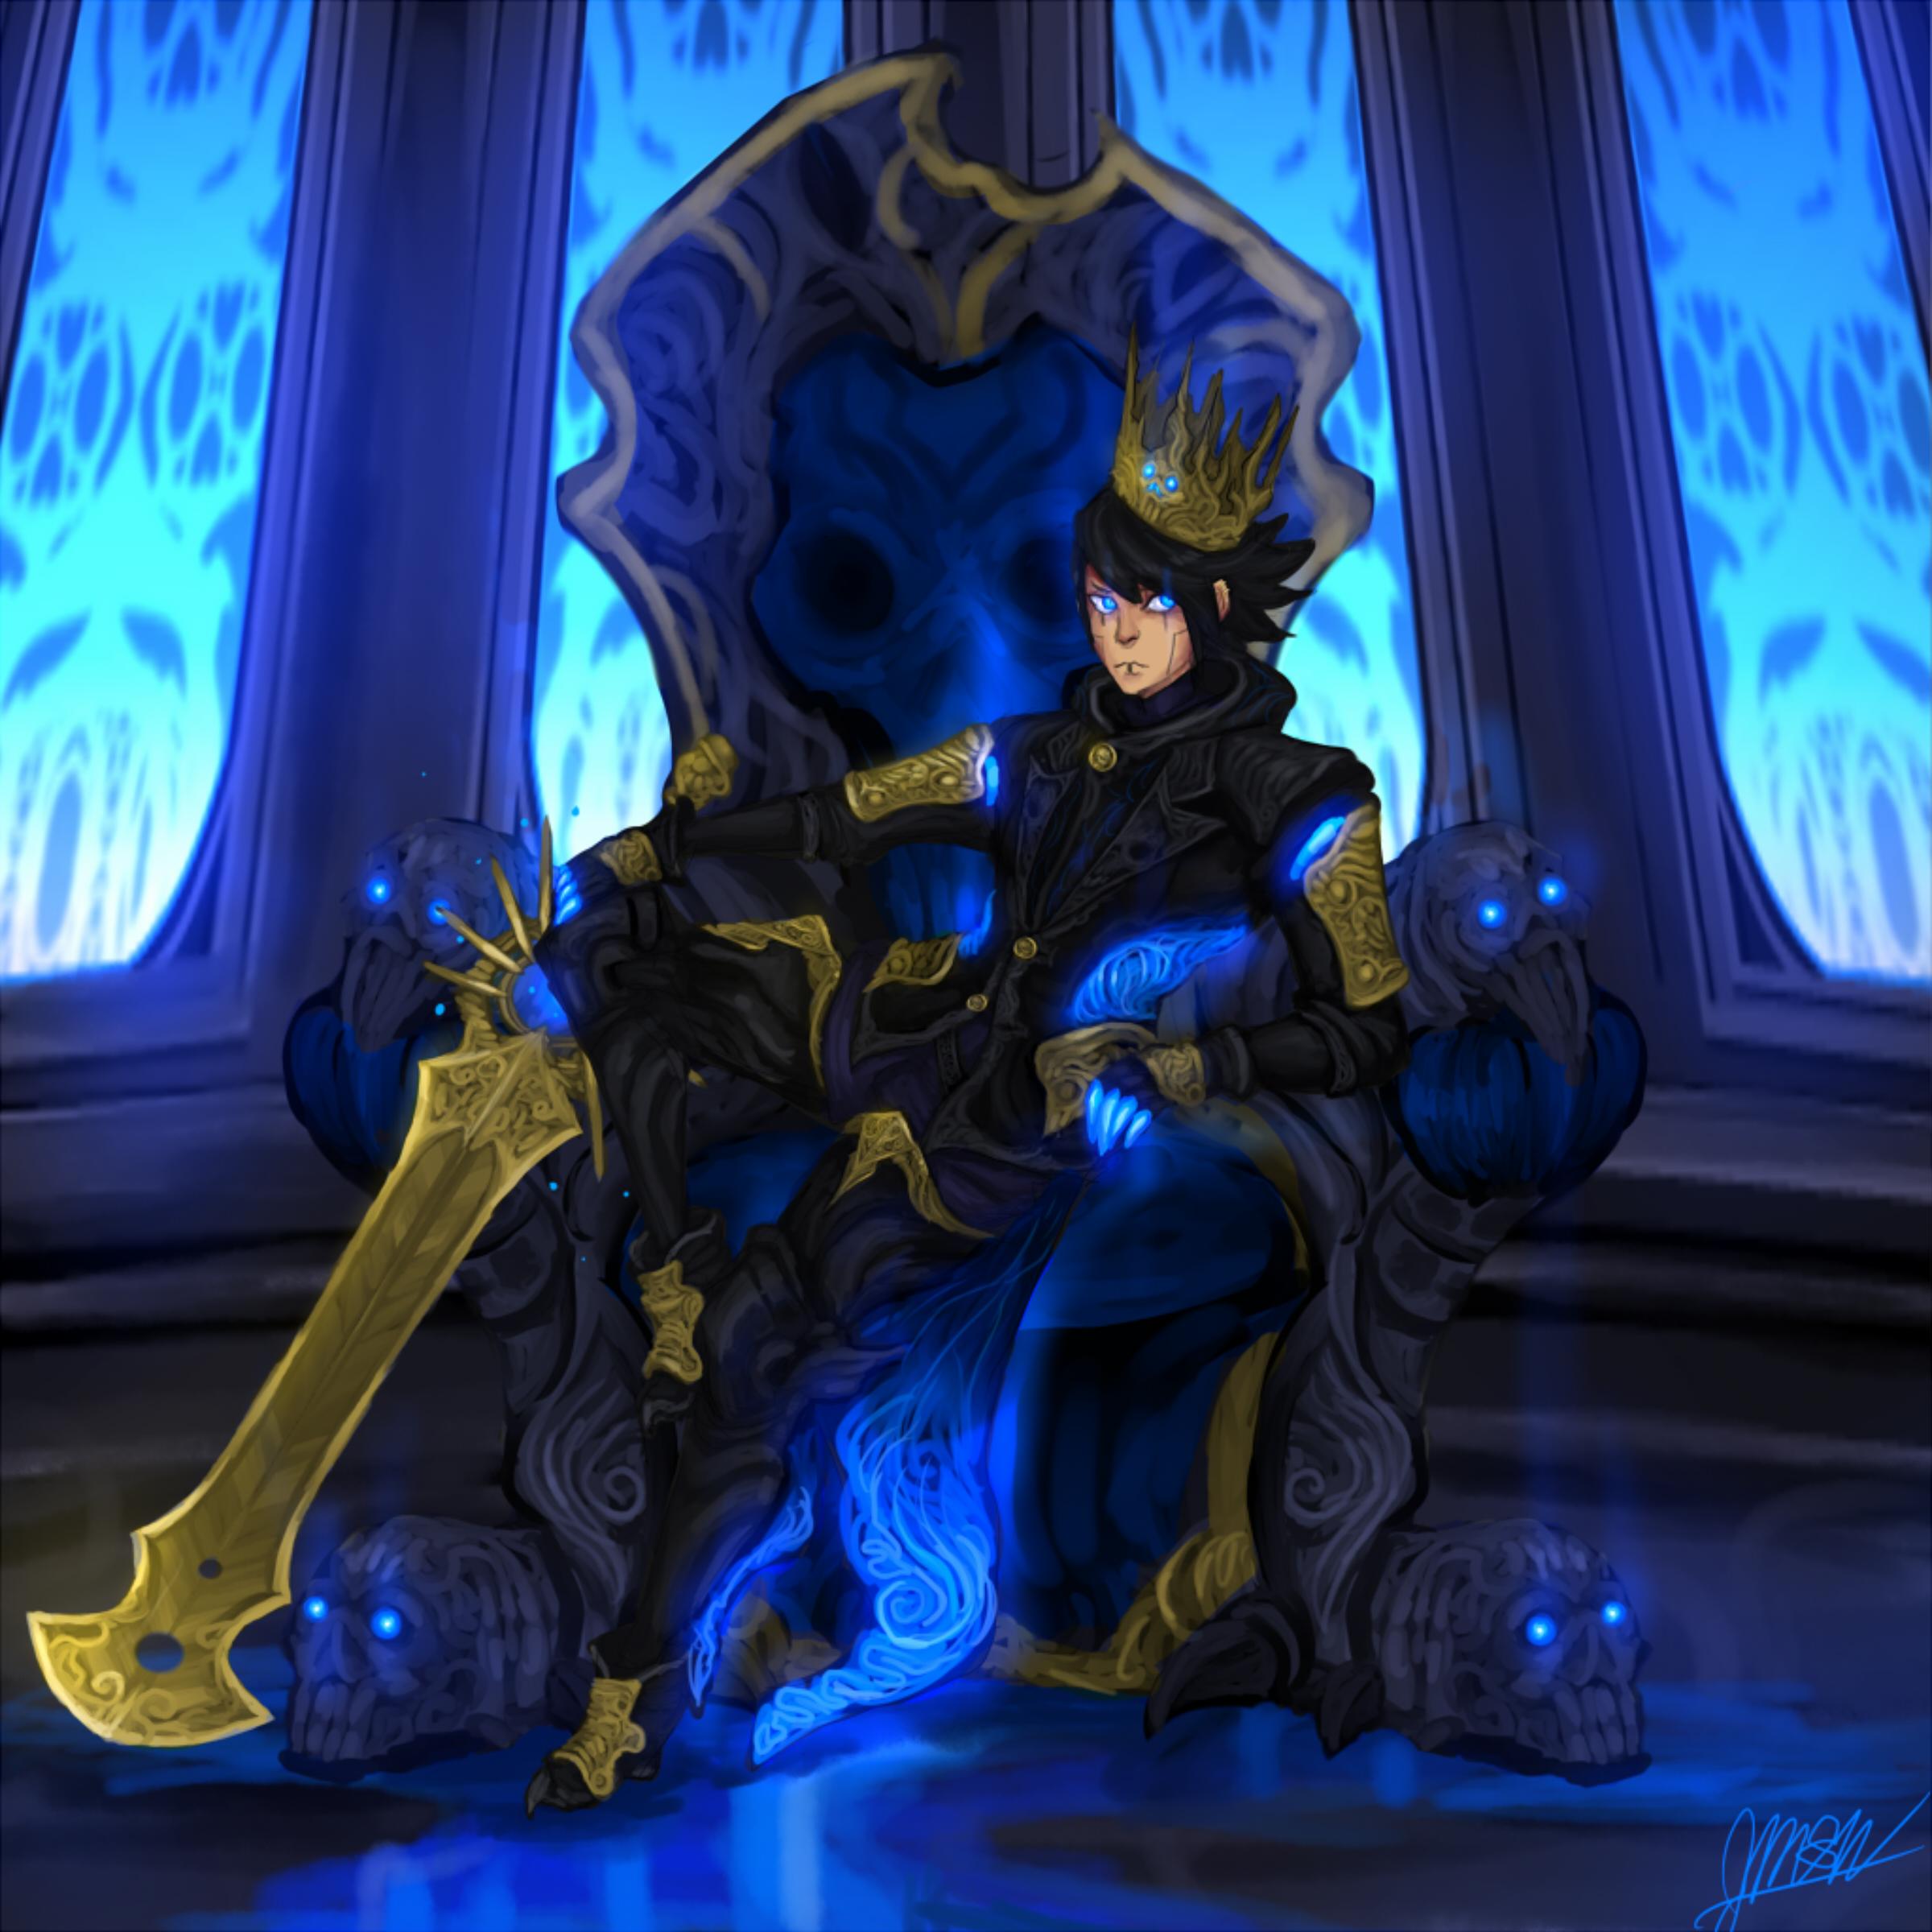 Primechus The Fallen Royalty